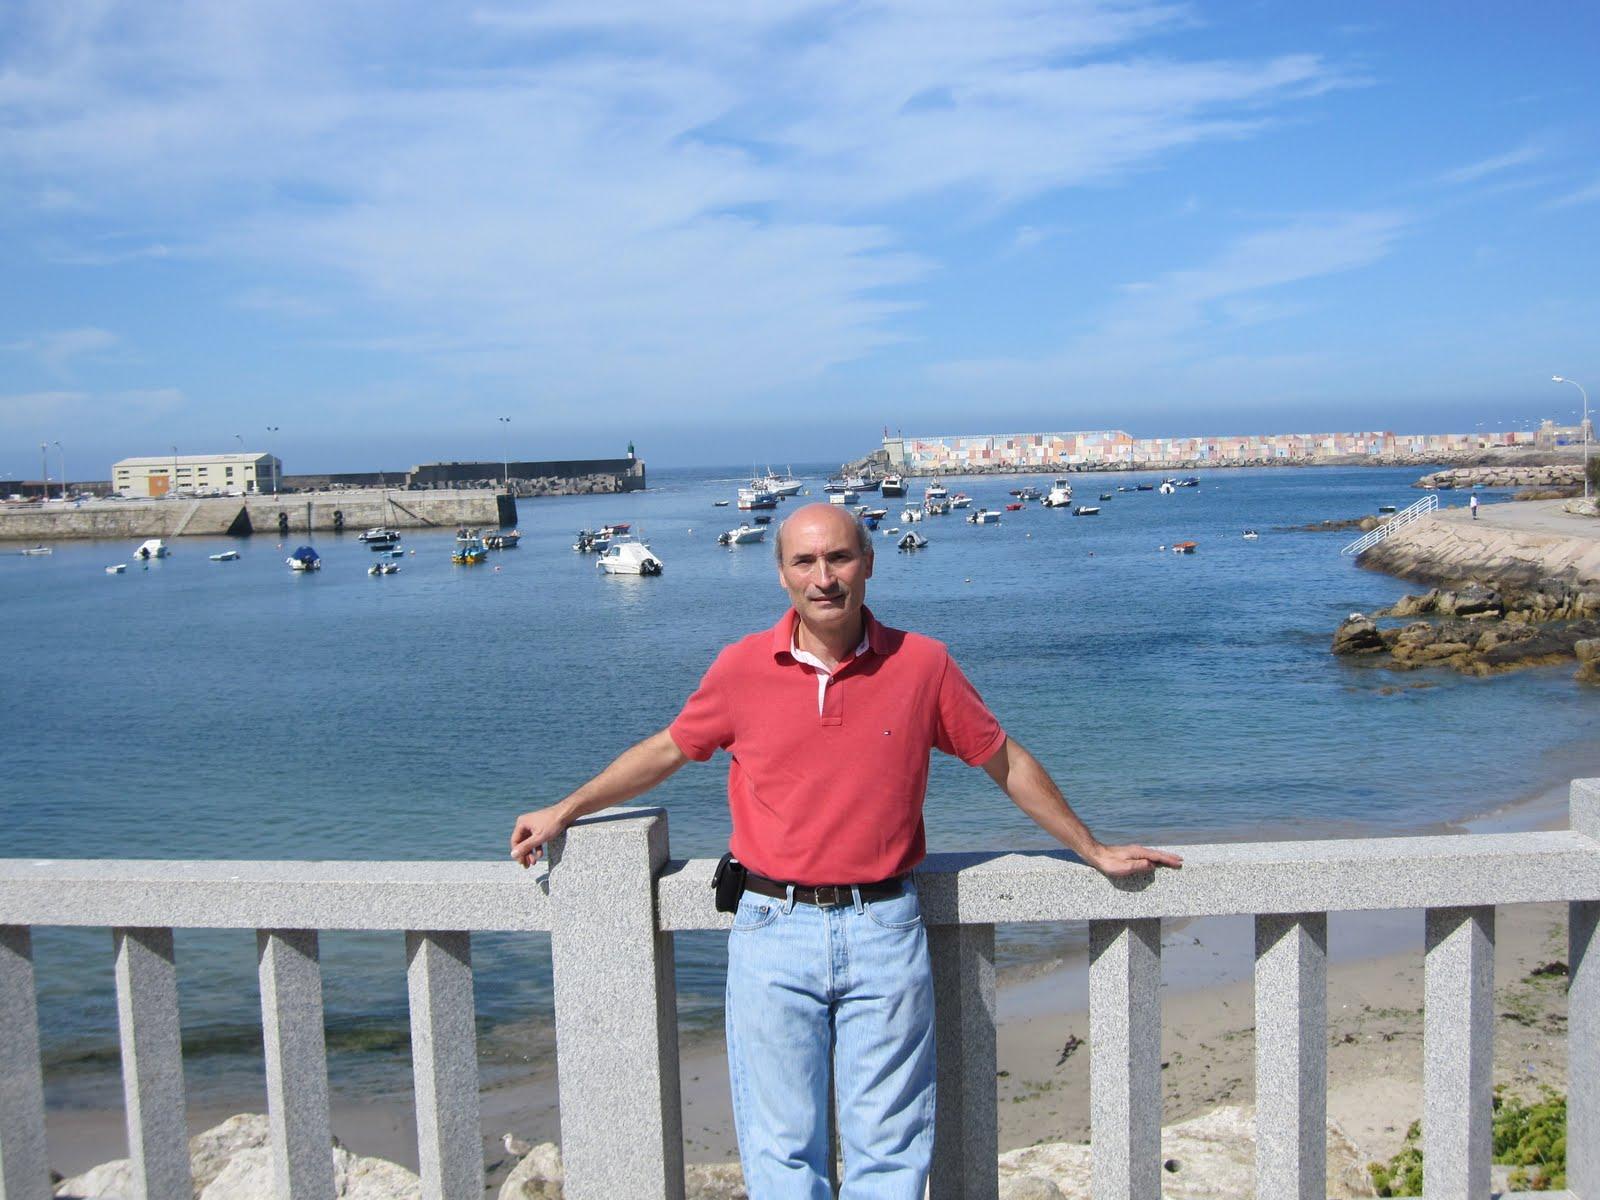 Podo basas al d a galicia portugal a guarda o rosal for Muebles portugal valenca